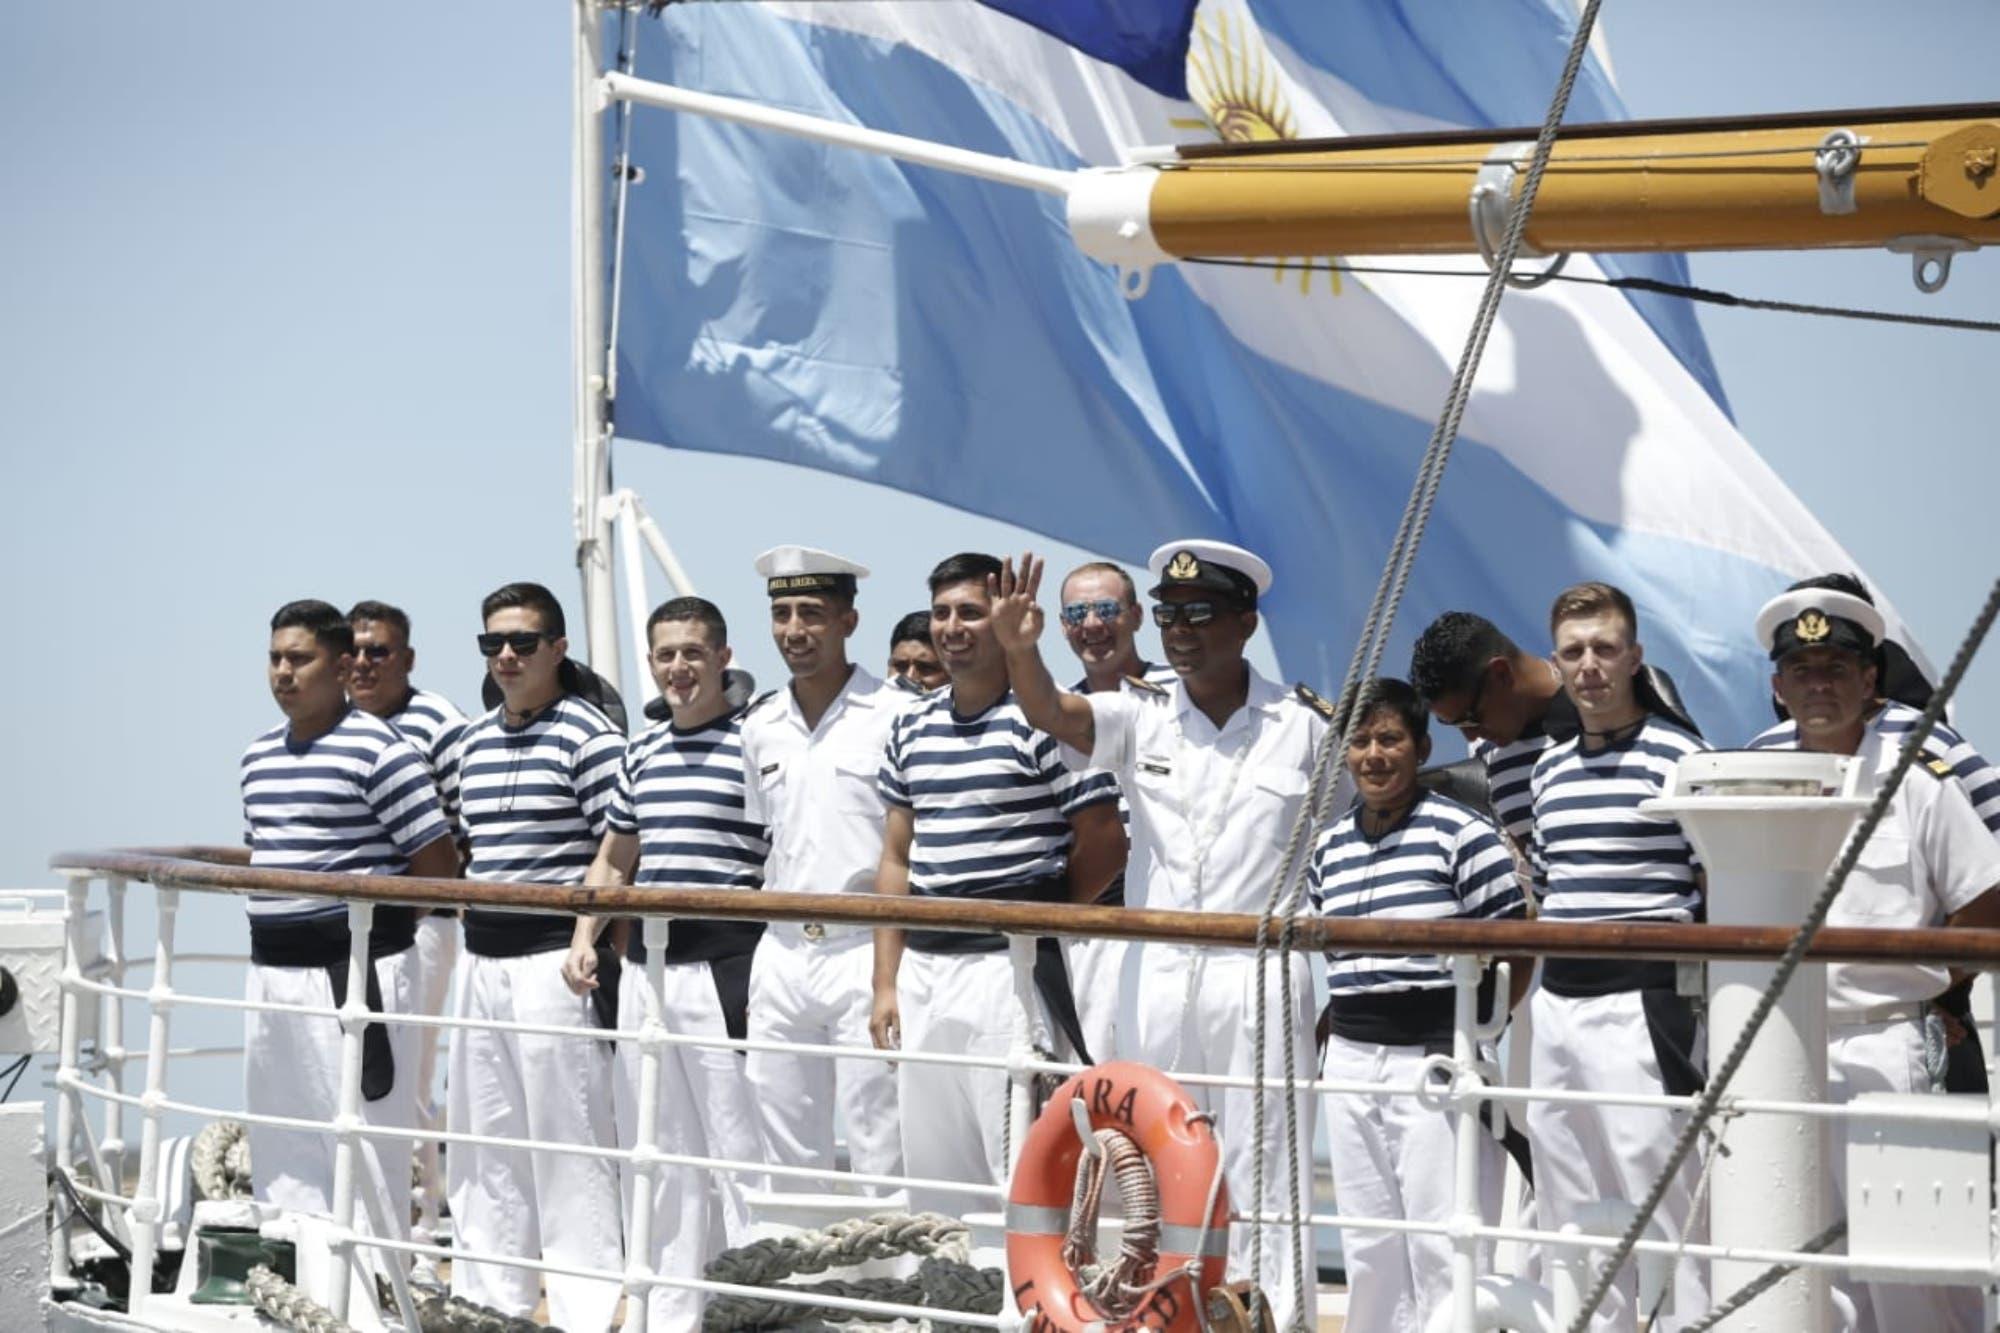 La Fragata Libertad amarró en Mar del Plata tras cinco meses de navegación